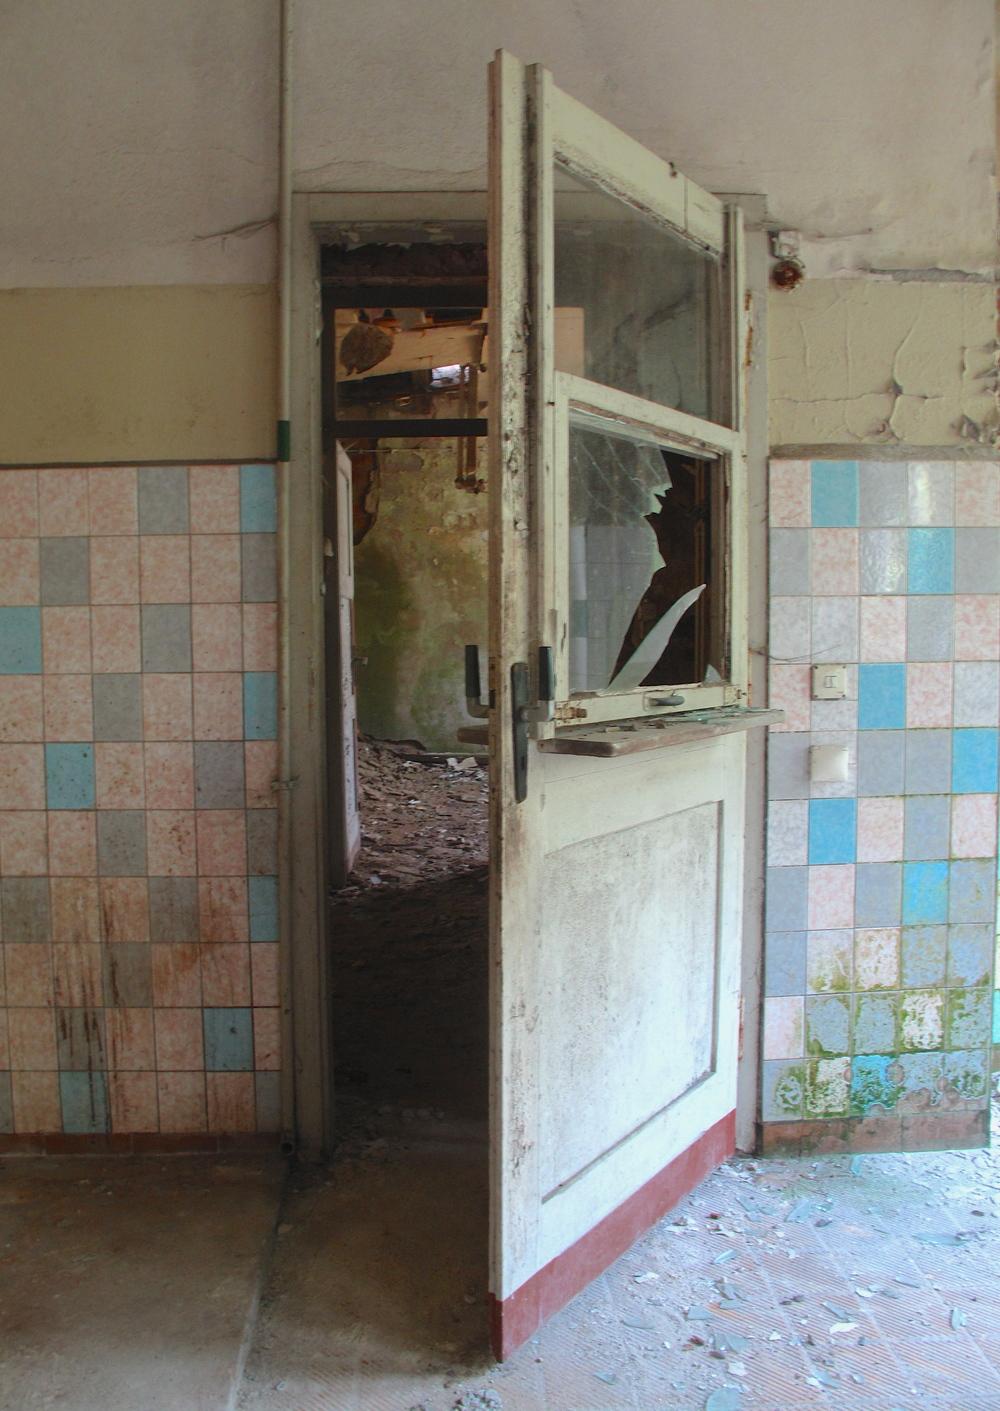 Doorway inside Elisabeth Sanatorium, with peeling wall paint and old tiles.